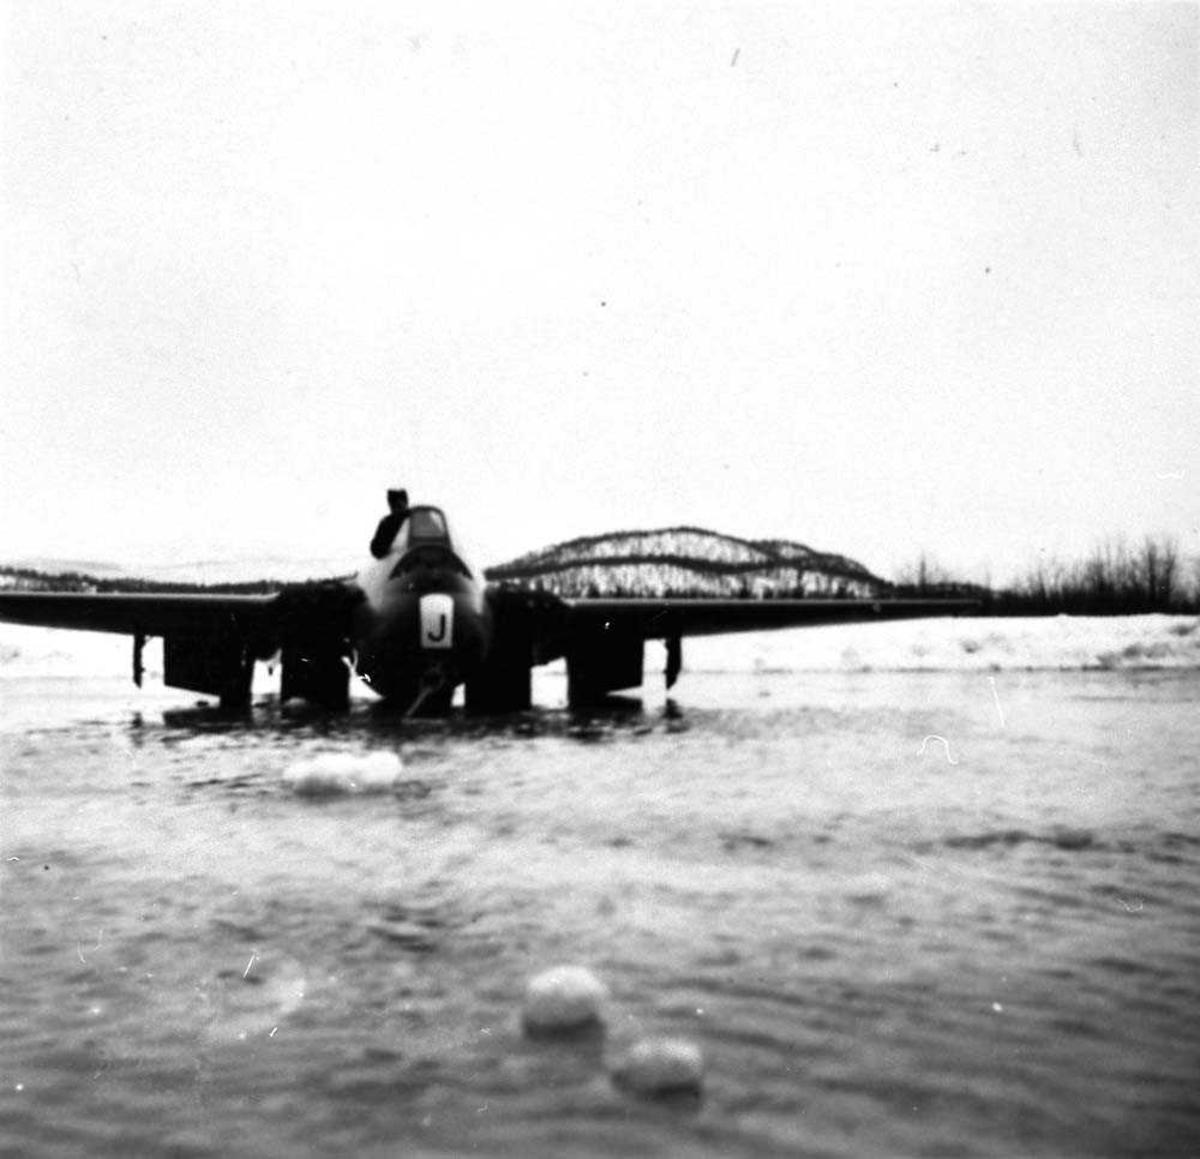 Ett fly som står i et vann, Vampire FB. Mk. 52. En person i flyet.